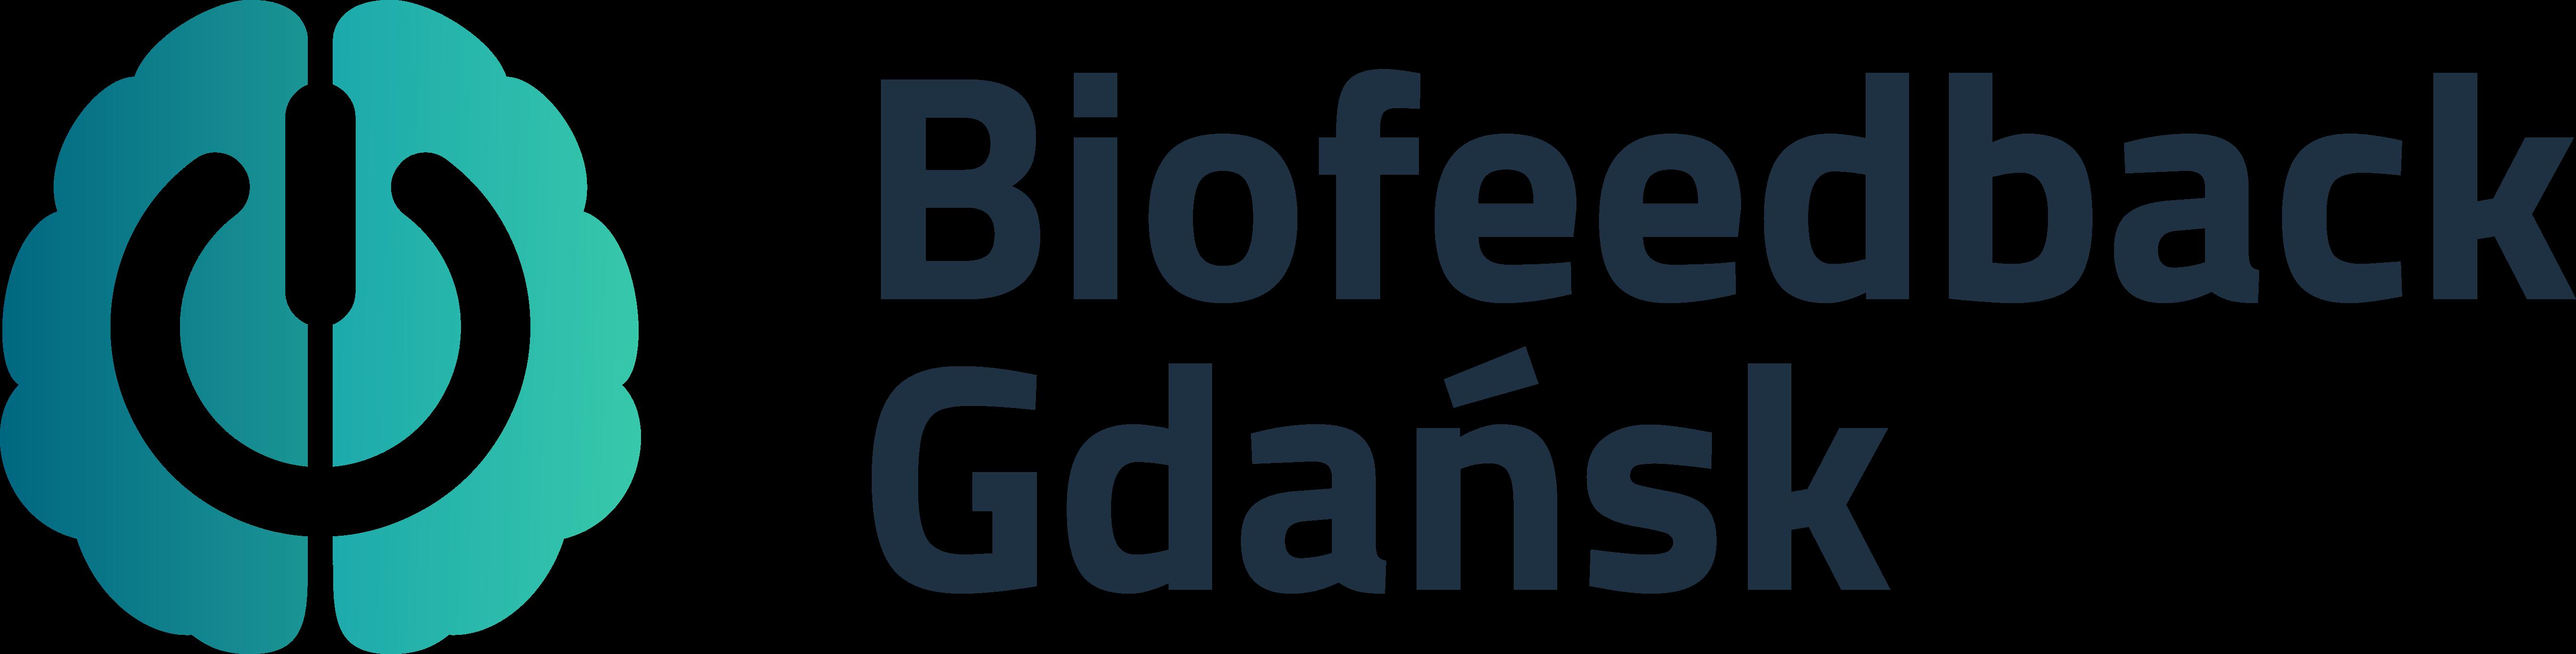 Biofeedback Gdańsk